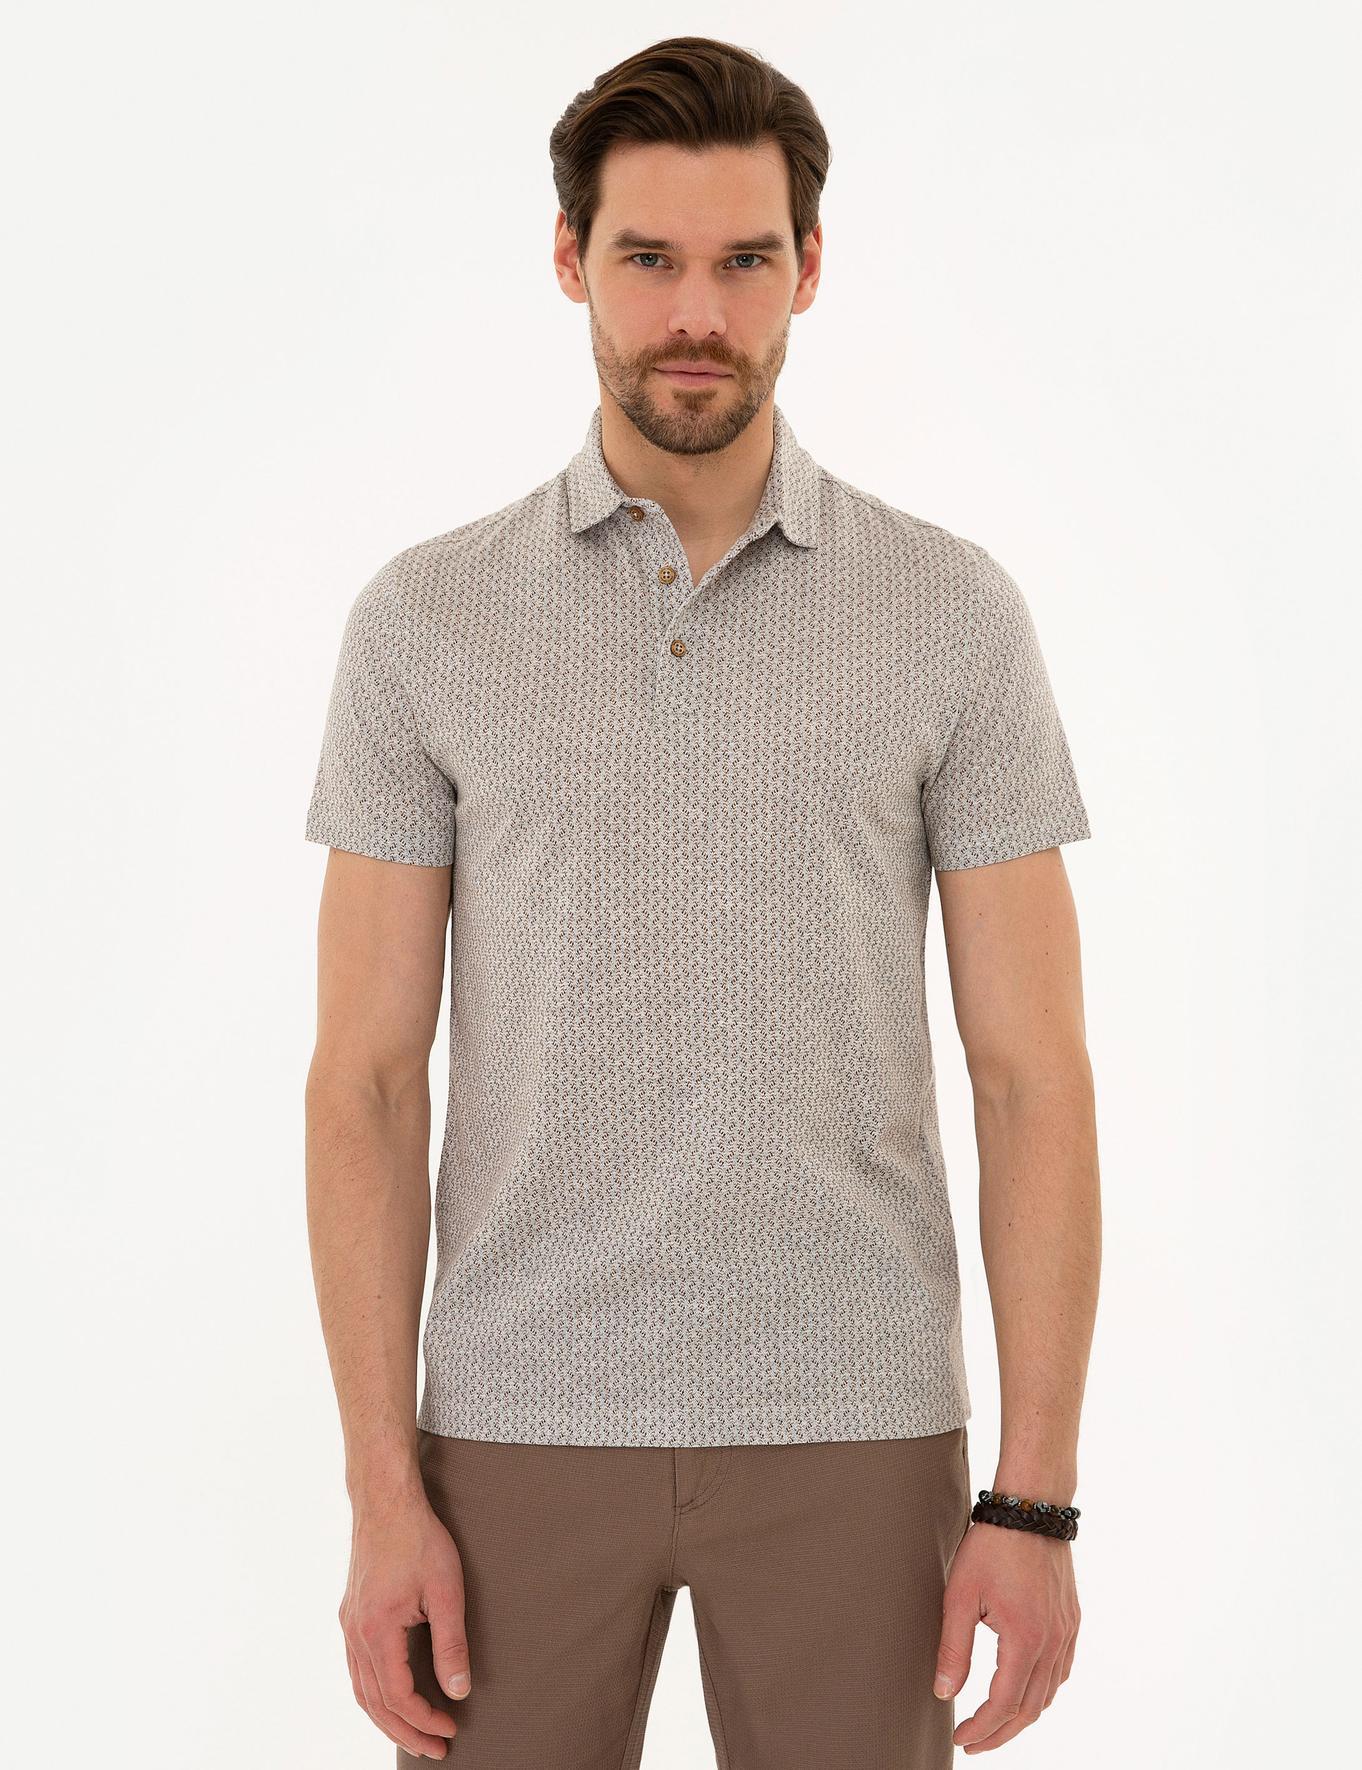 Açık Kahverengi Slim Fit Merserize Polo Yaka T-Shirt